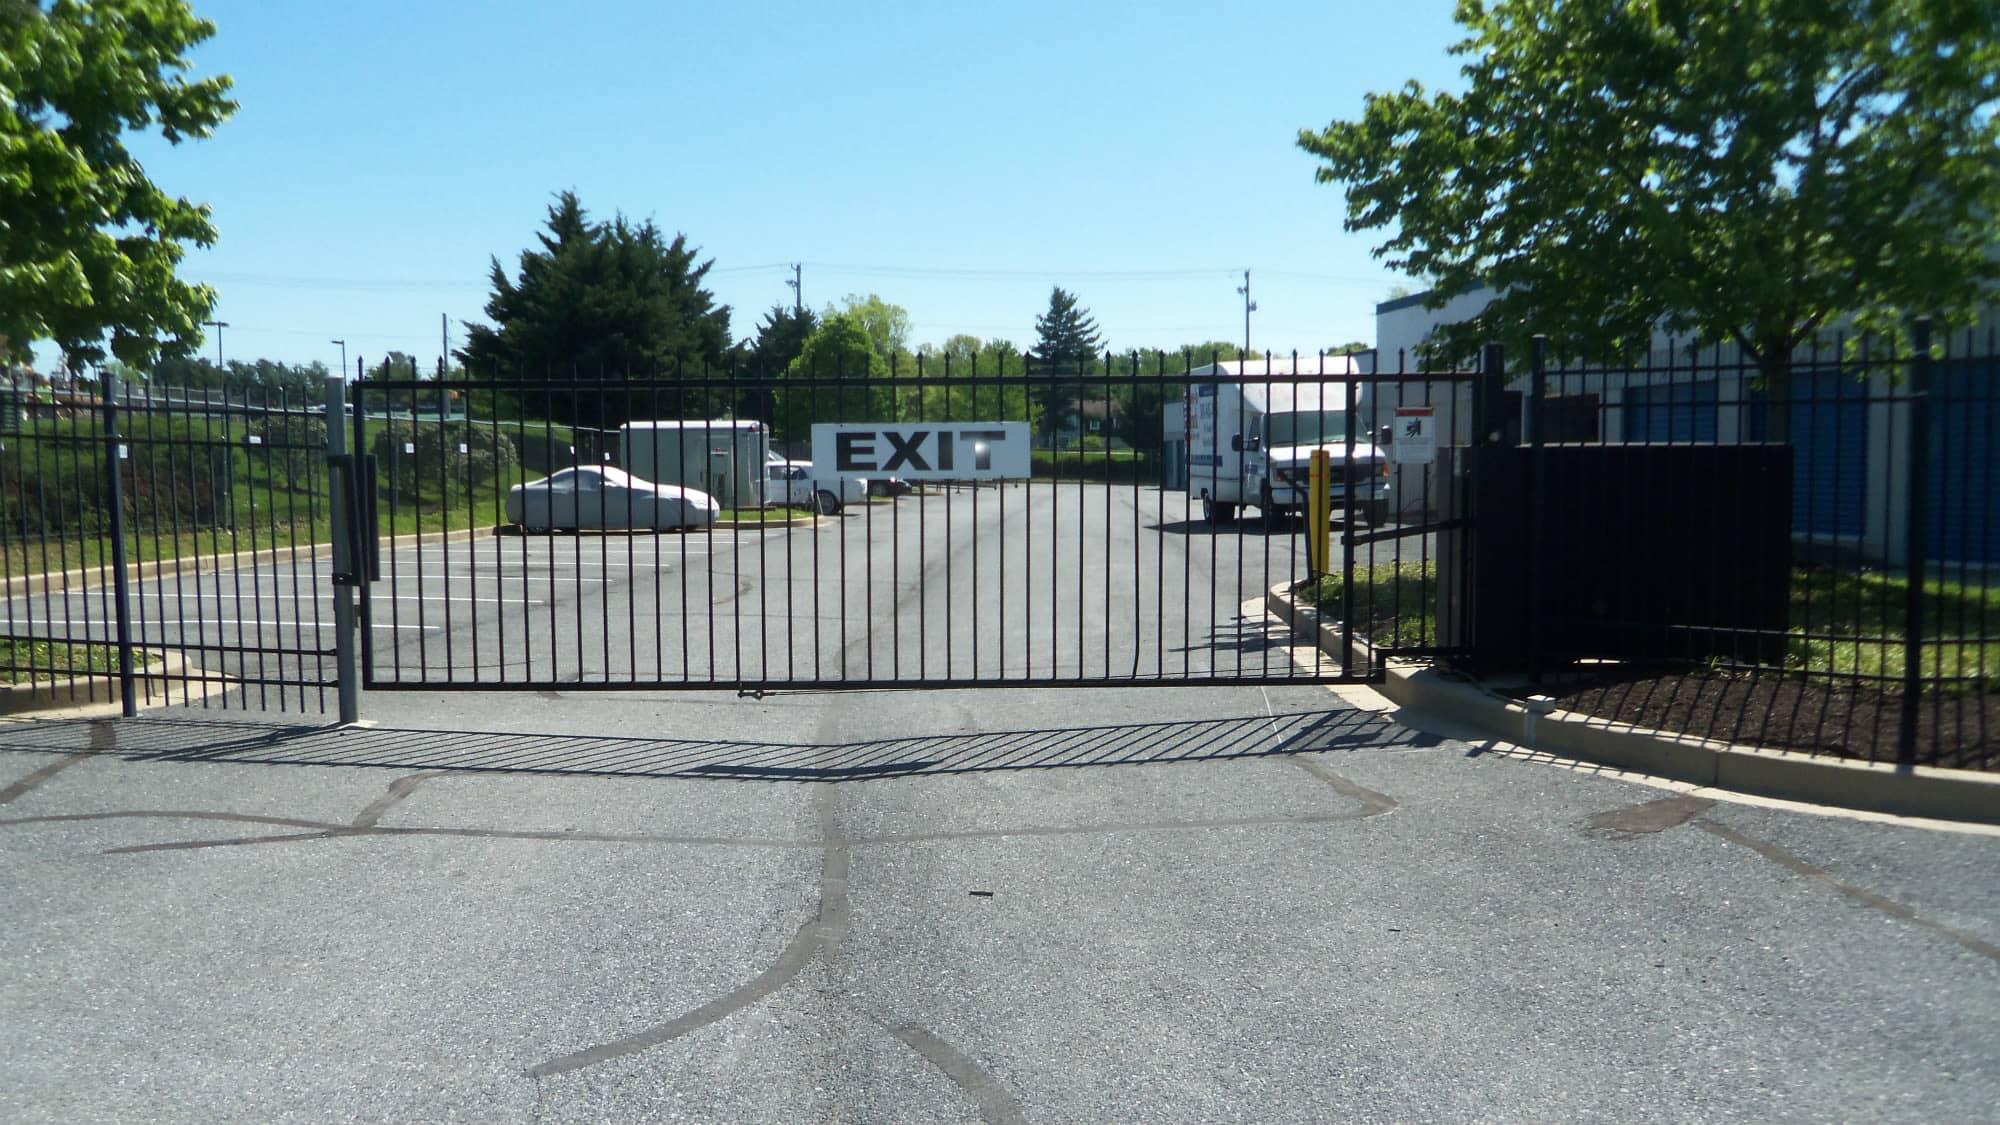 Exit gate at Self Storage Plus in Walkersville, MD